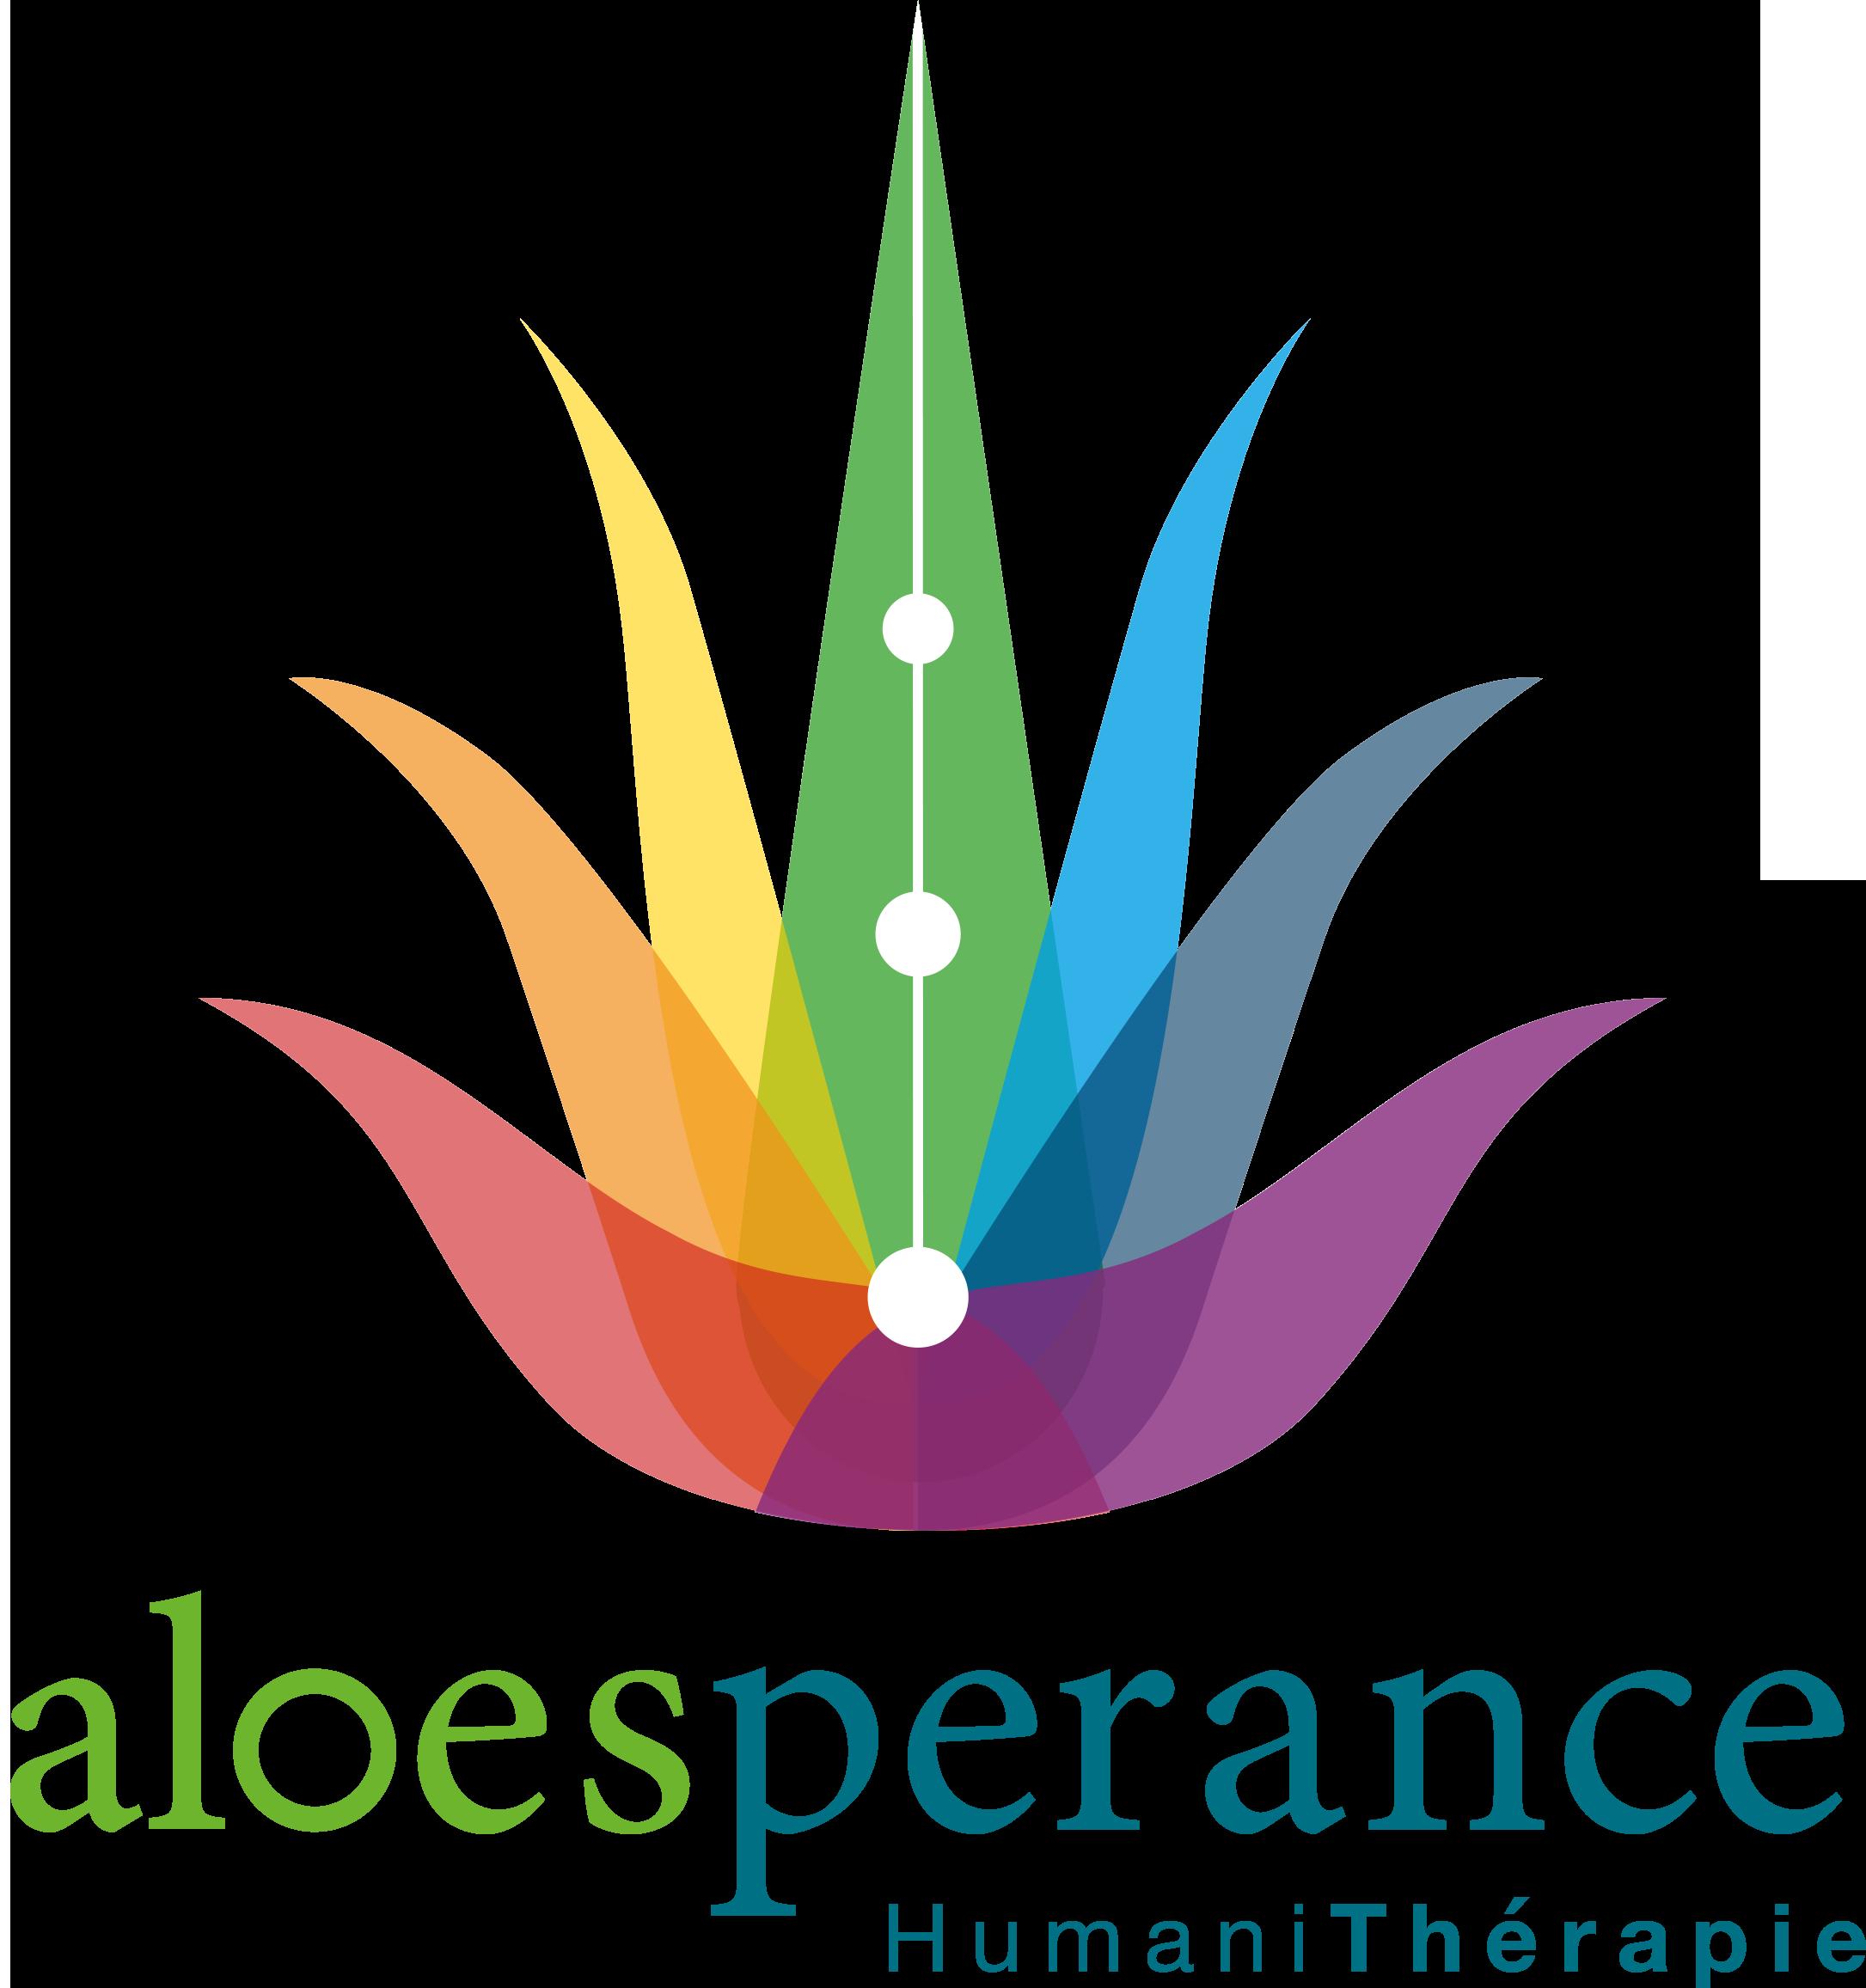 Aloesperance